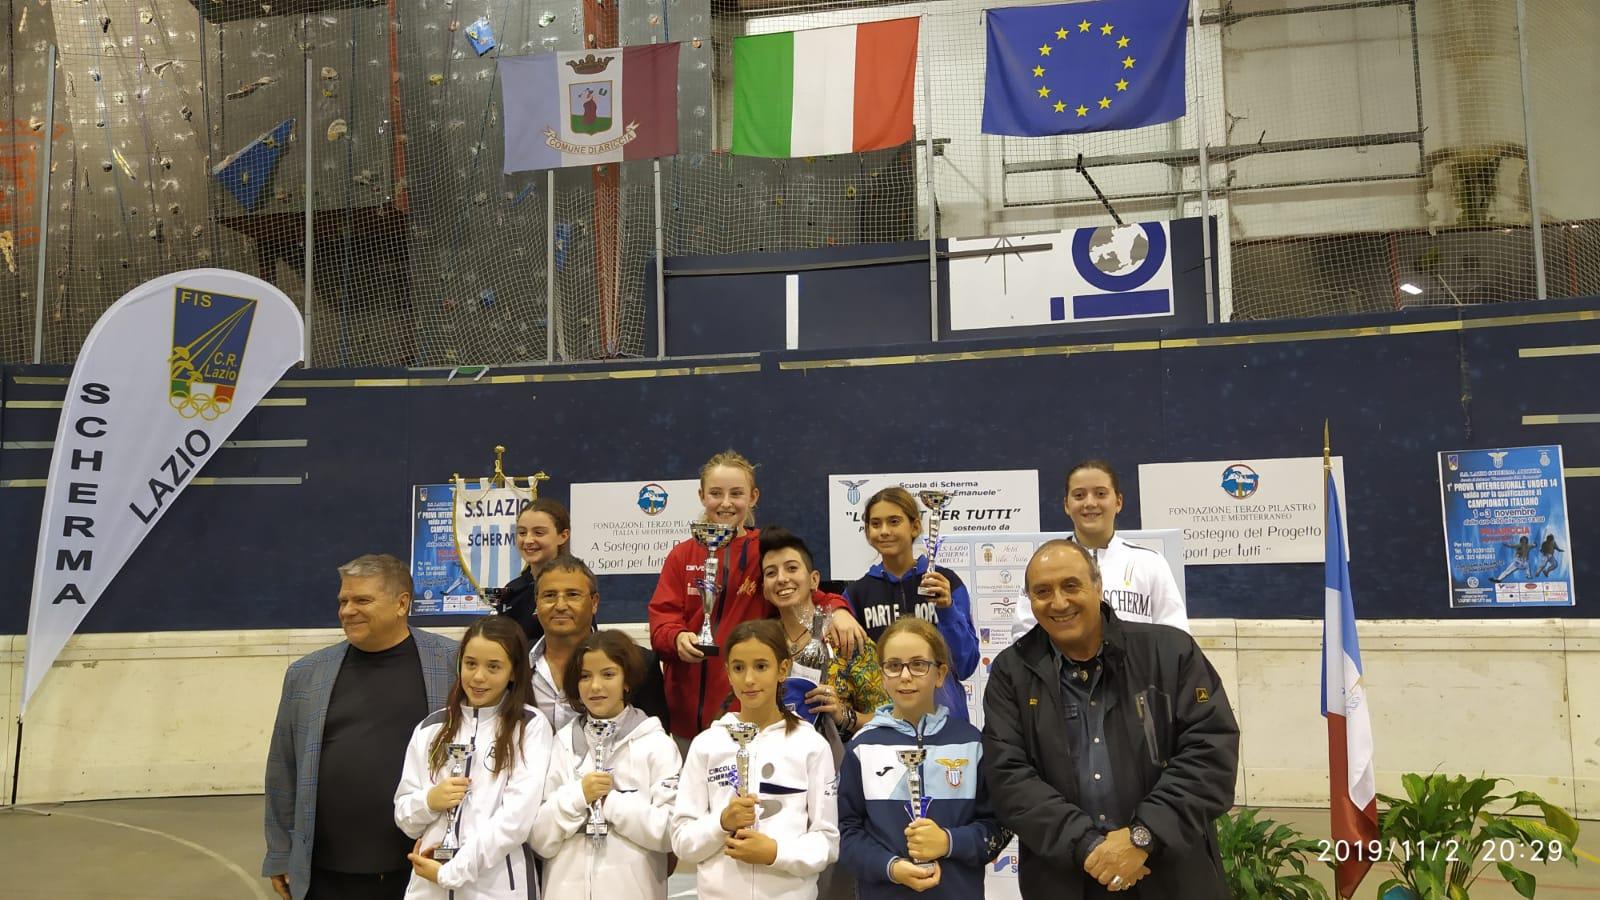 Scherma| Week end positivo per l'Accademia Olimpica Beneventana